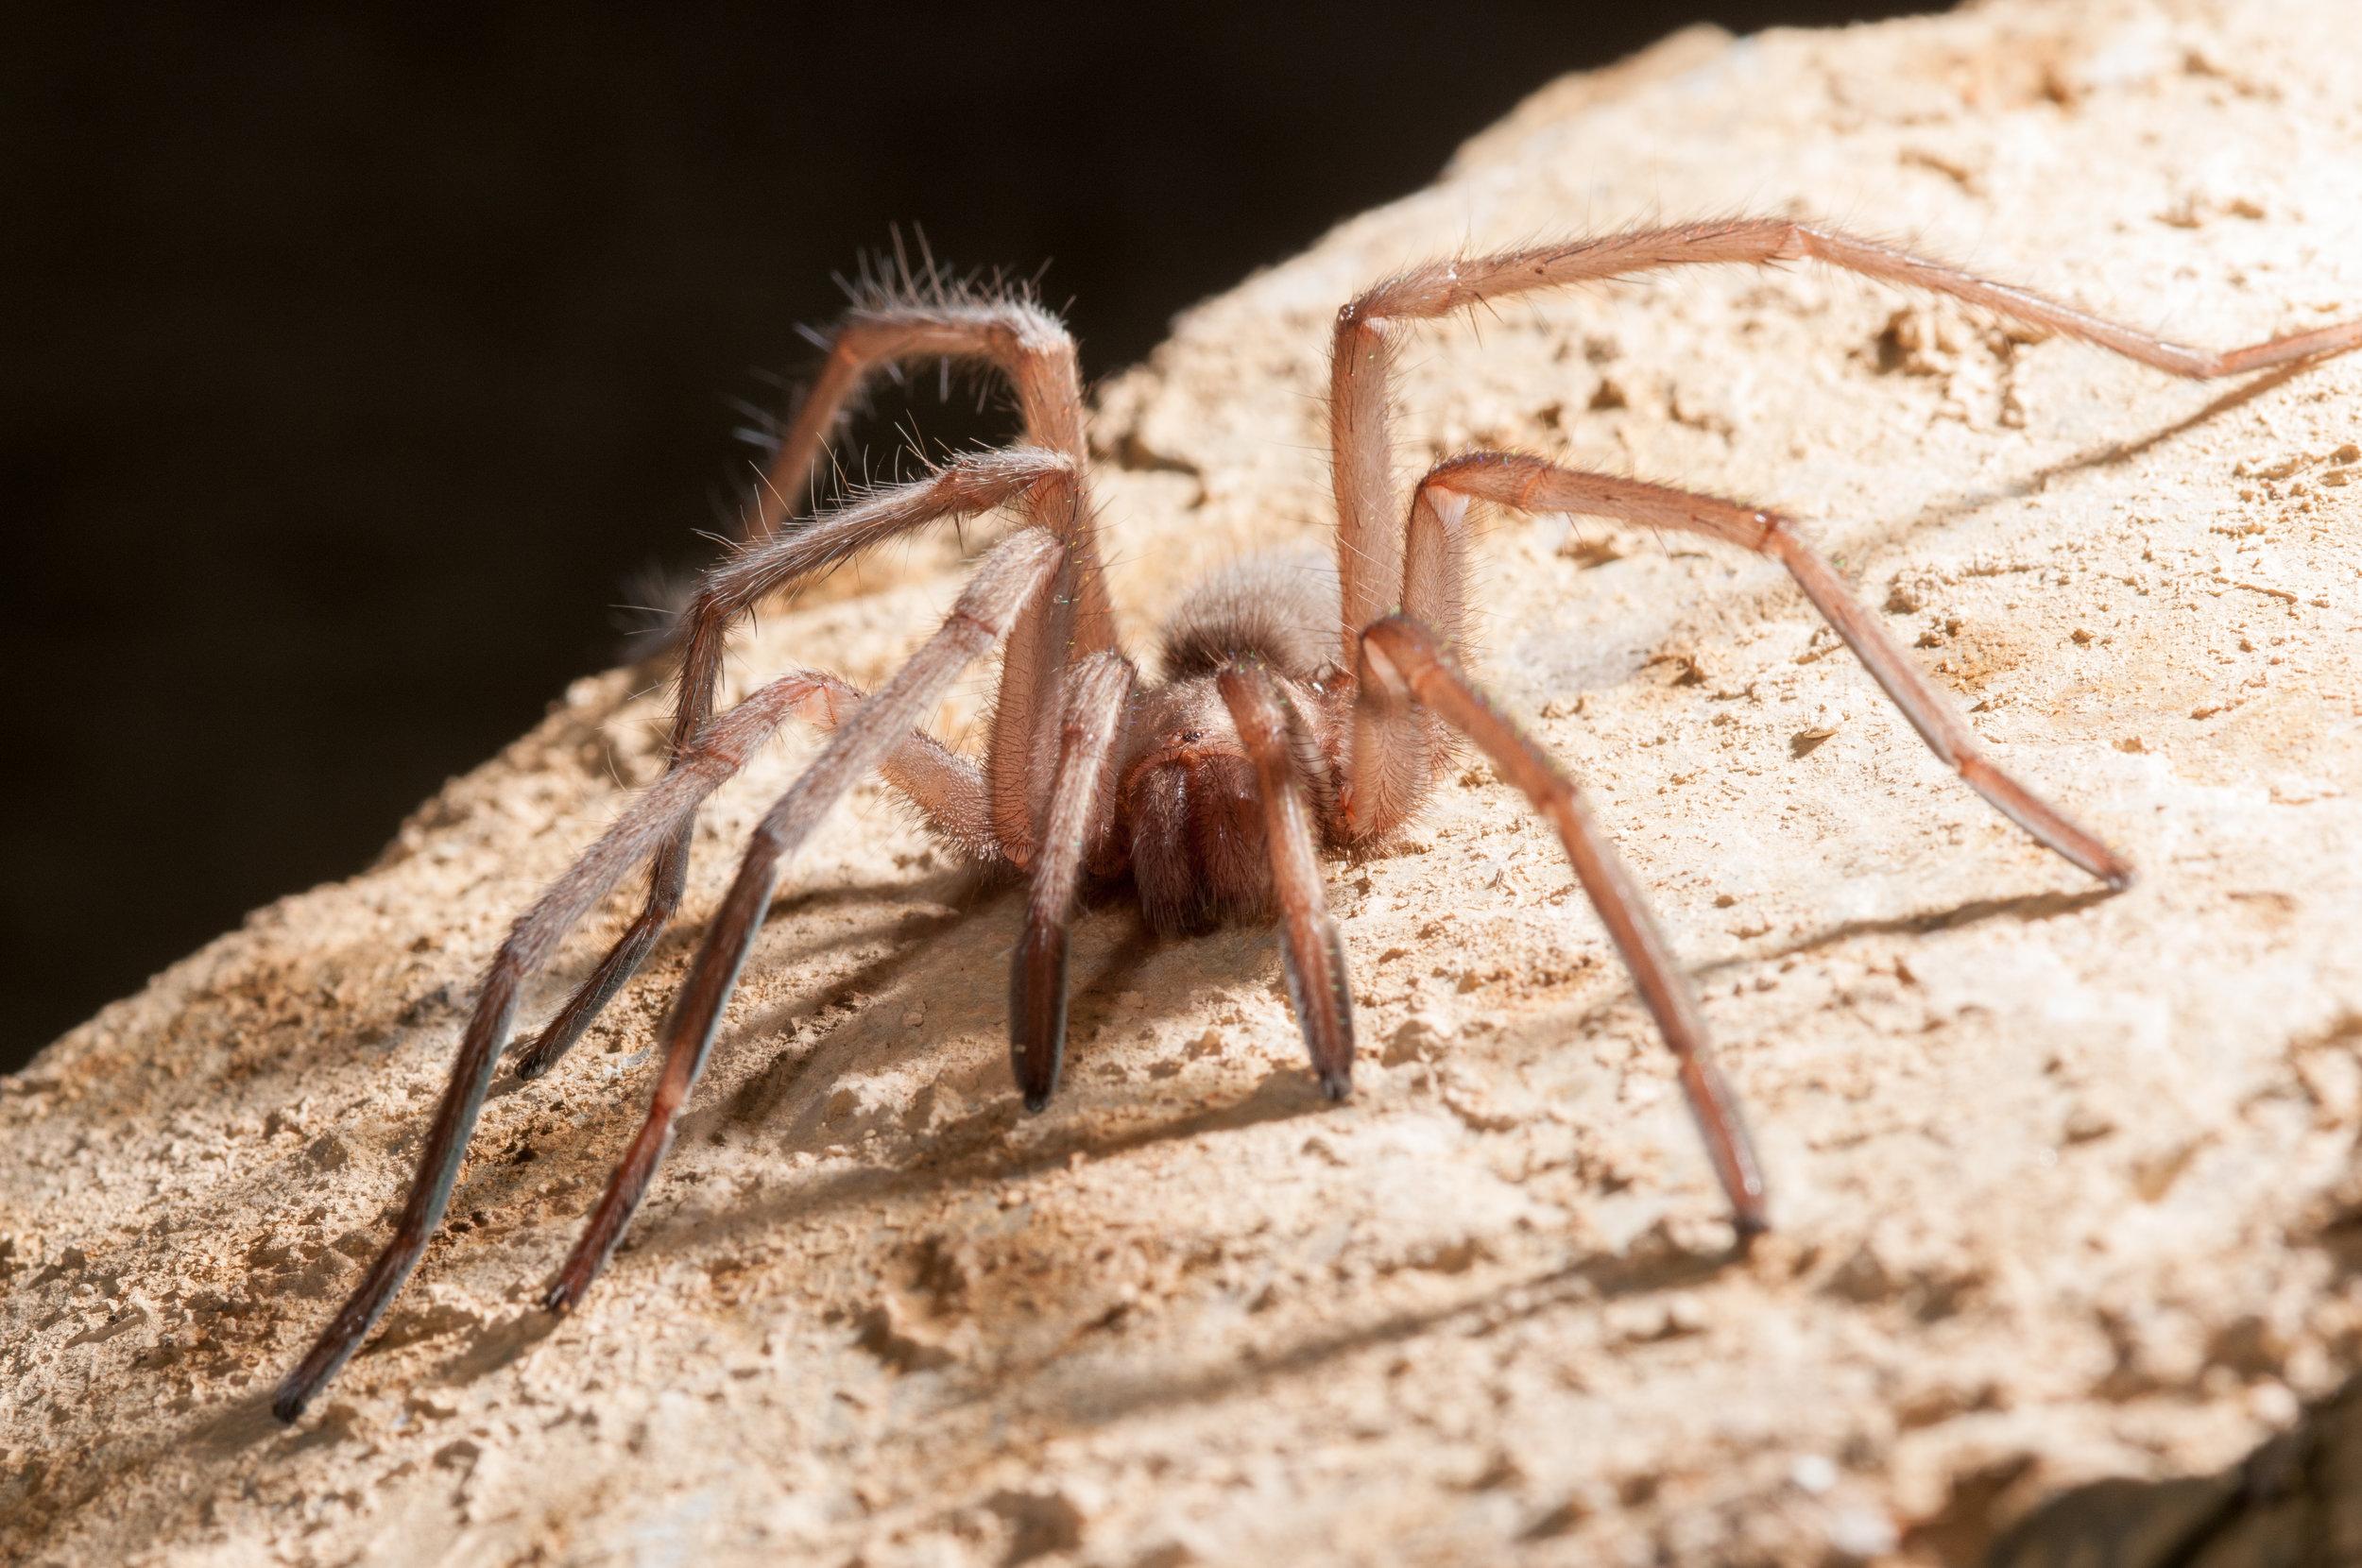 Troglobitic tarantula from Church Cave,  Hemirrhagus  sp.